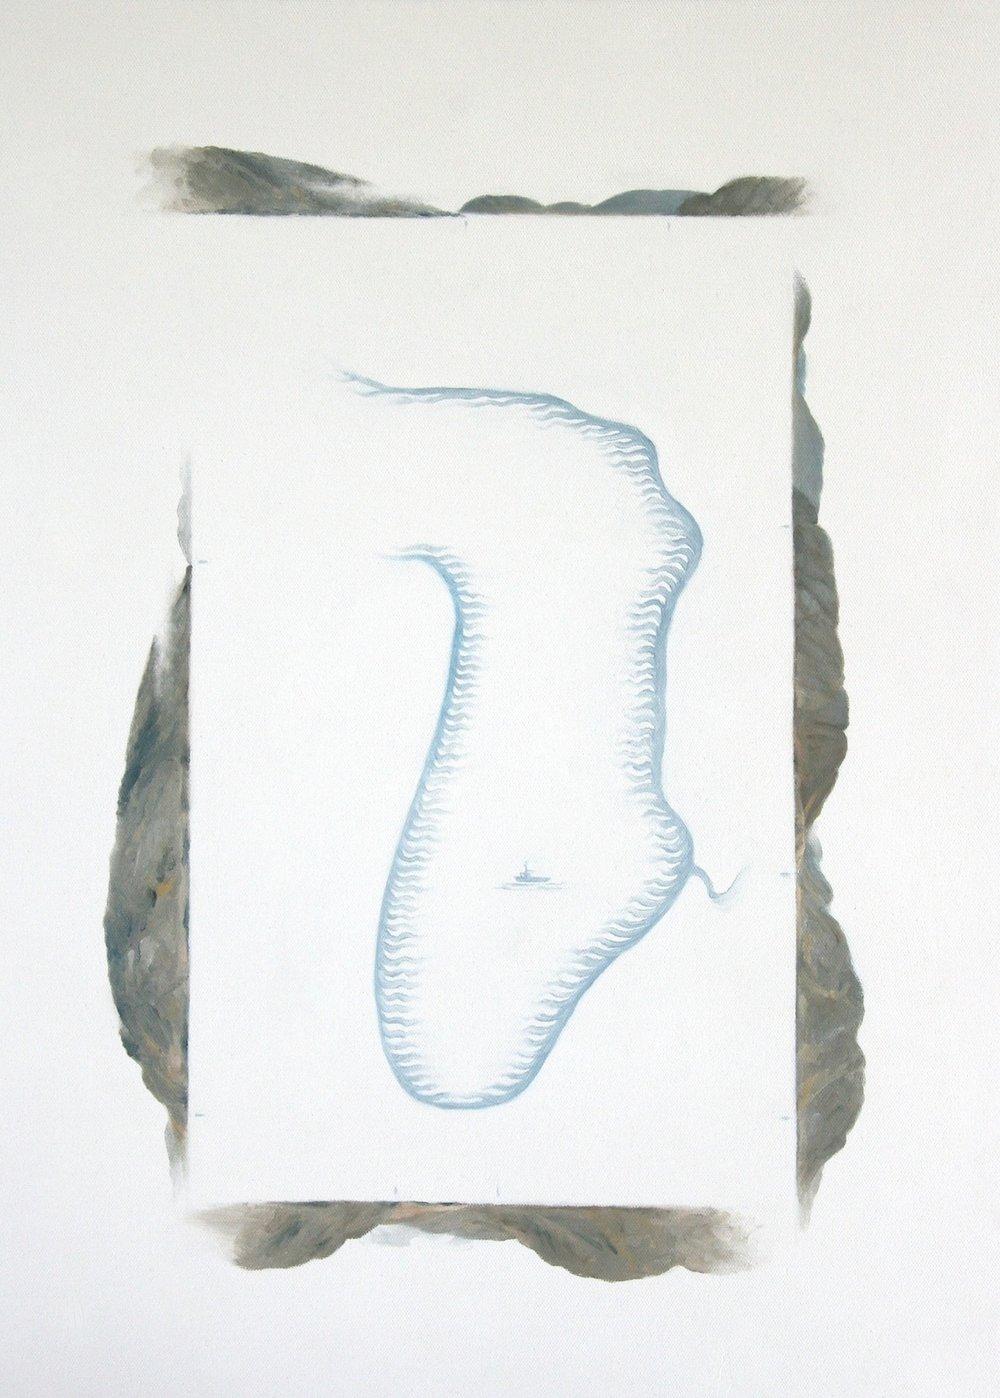 Kanaqukjuaq , 61cm x 46cm. Oil on Canvas